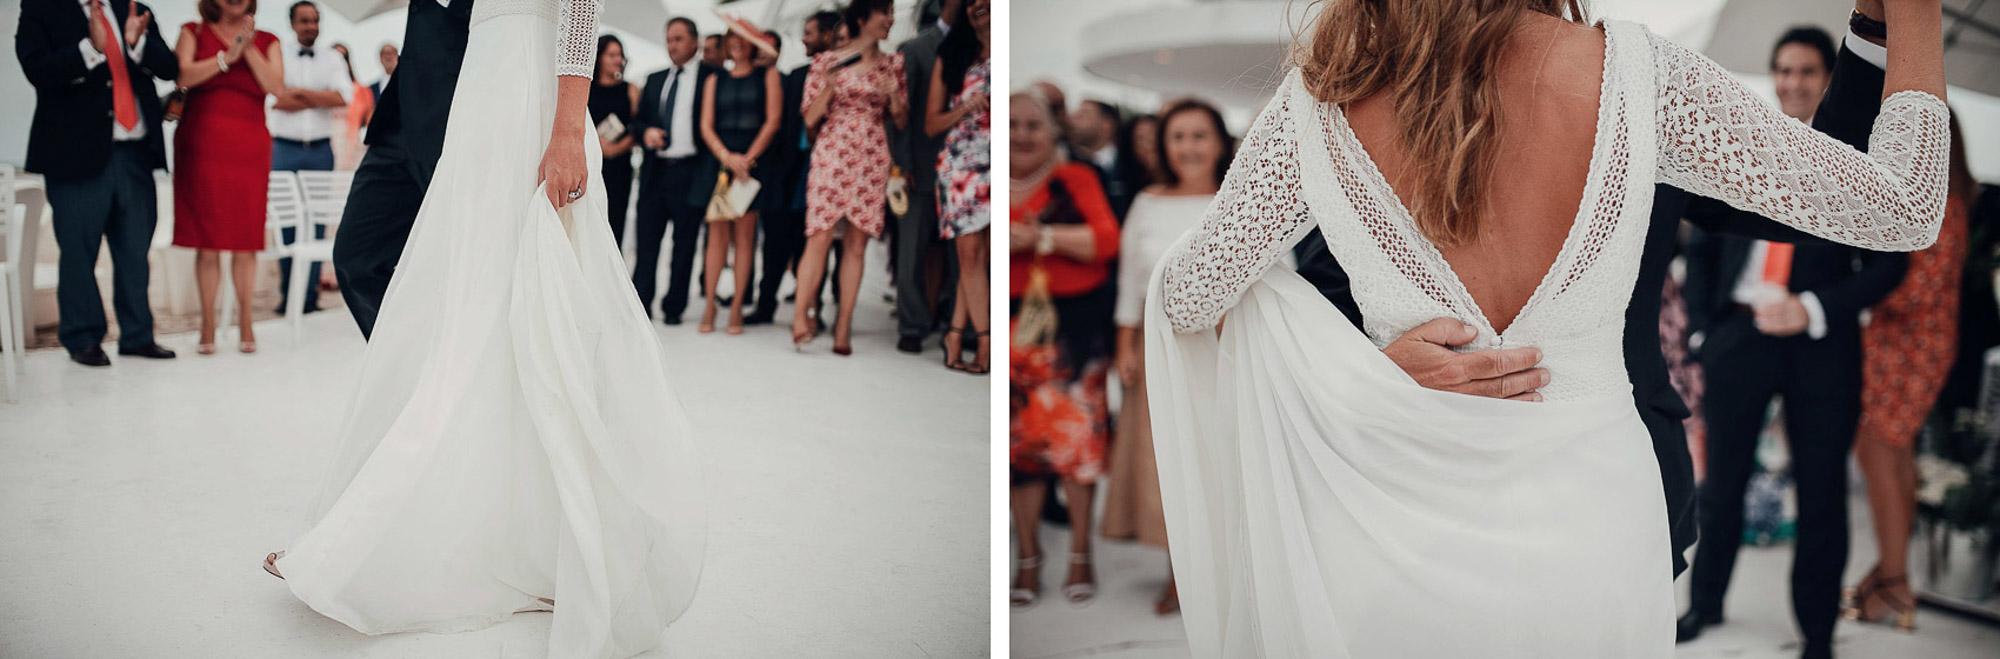 baile wedding novia vestido Cabo de Palos fotografia